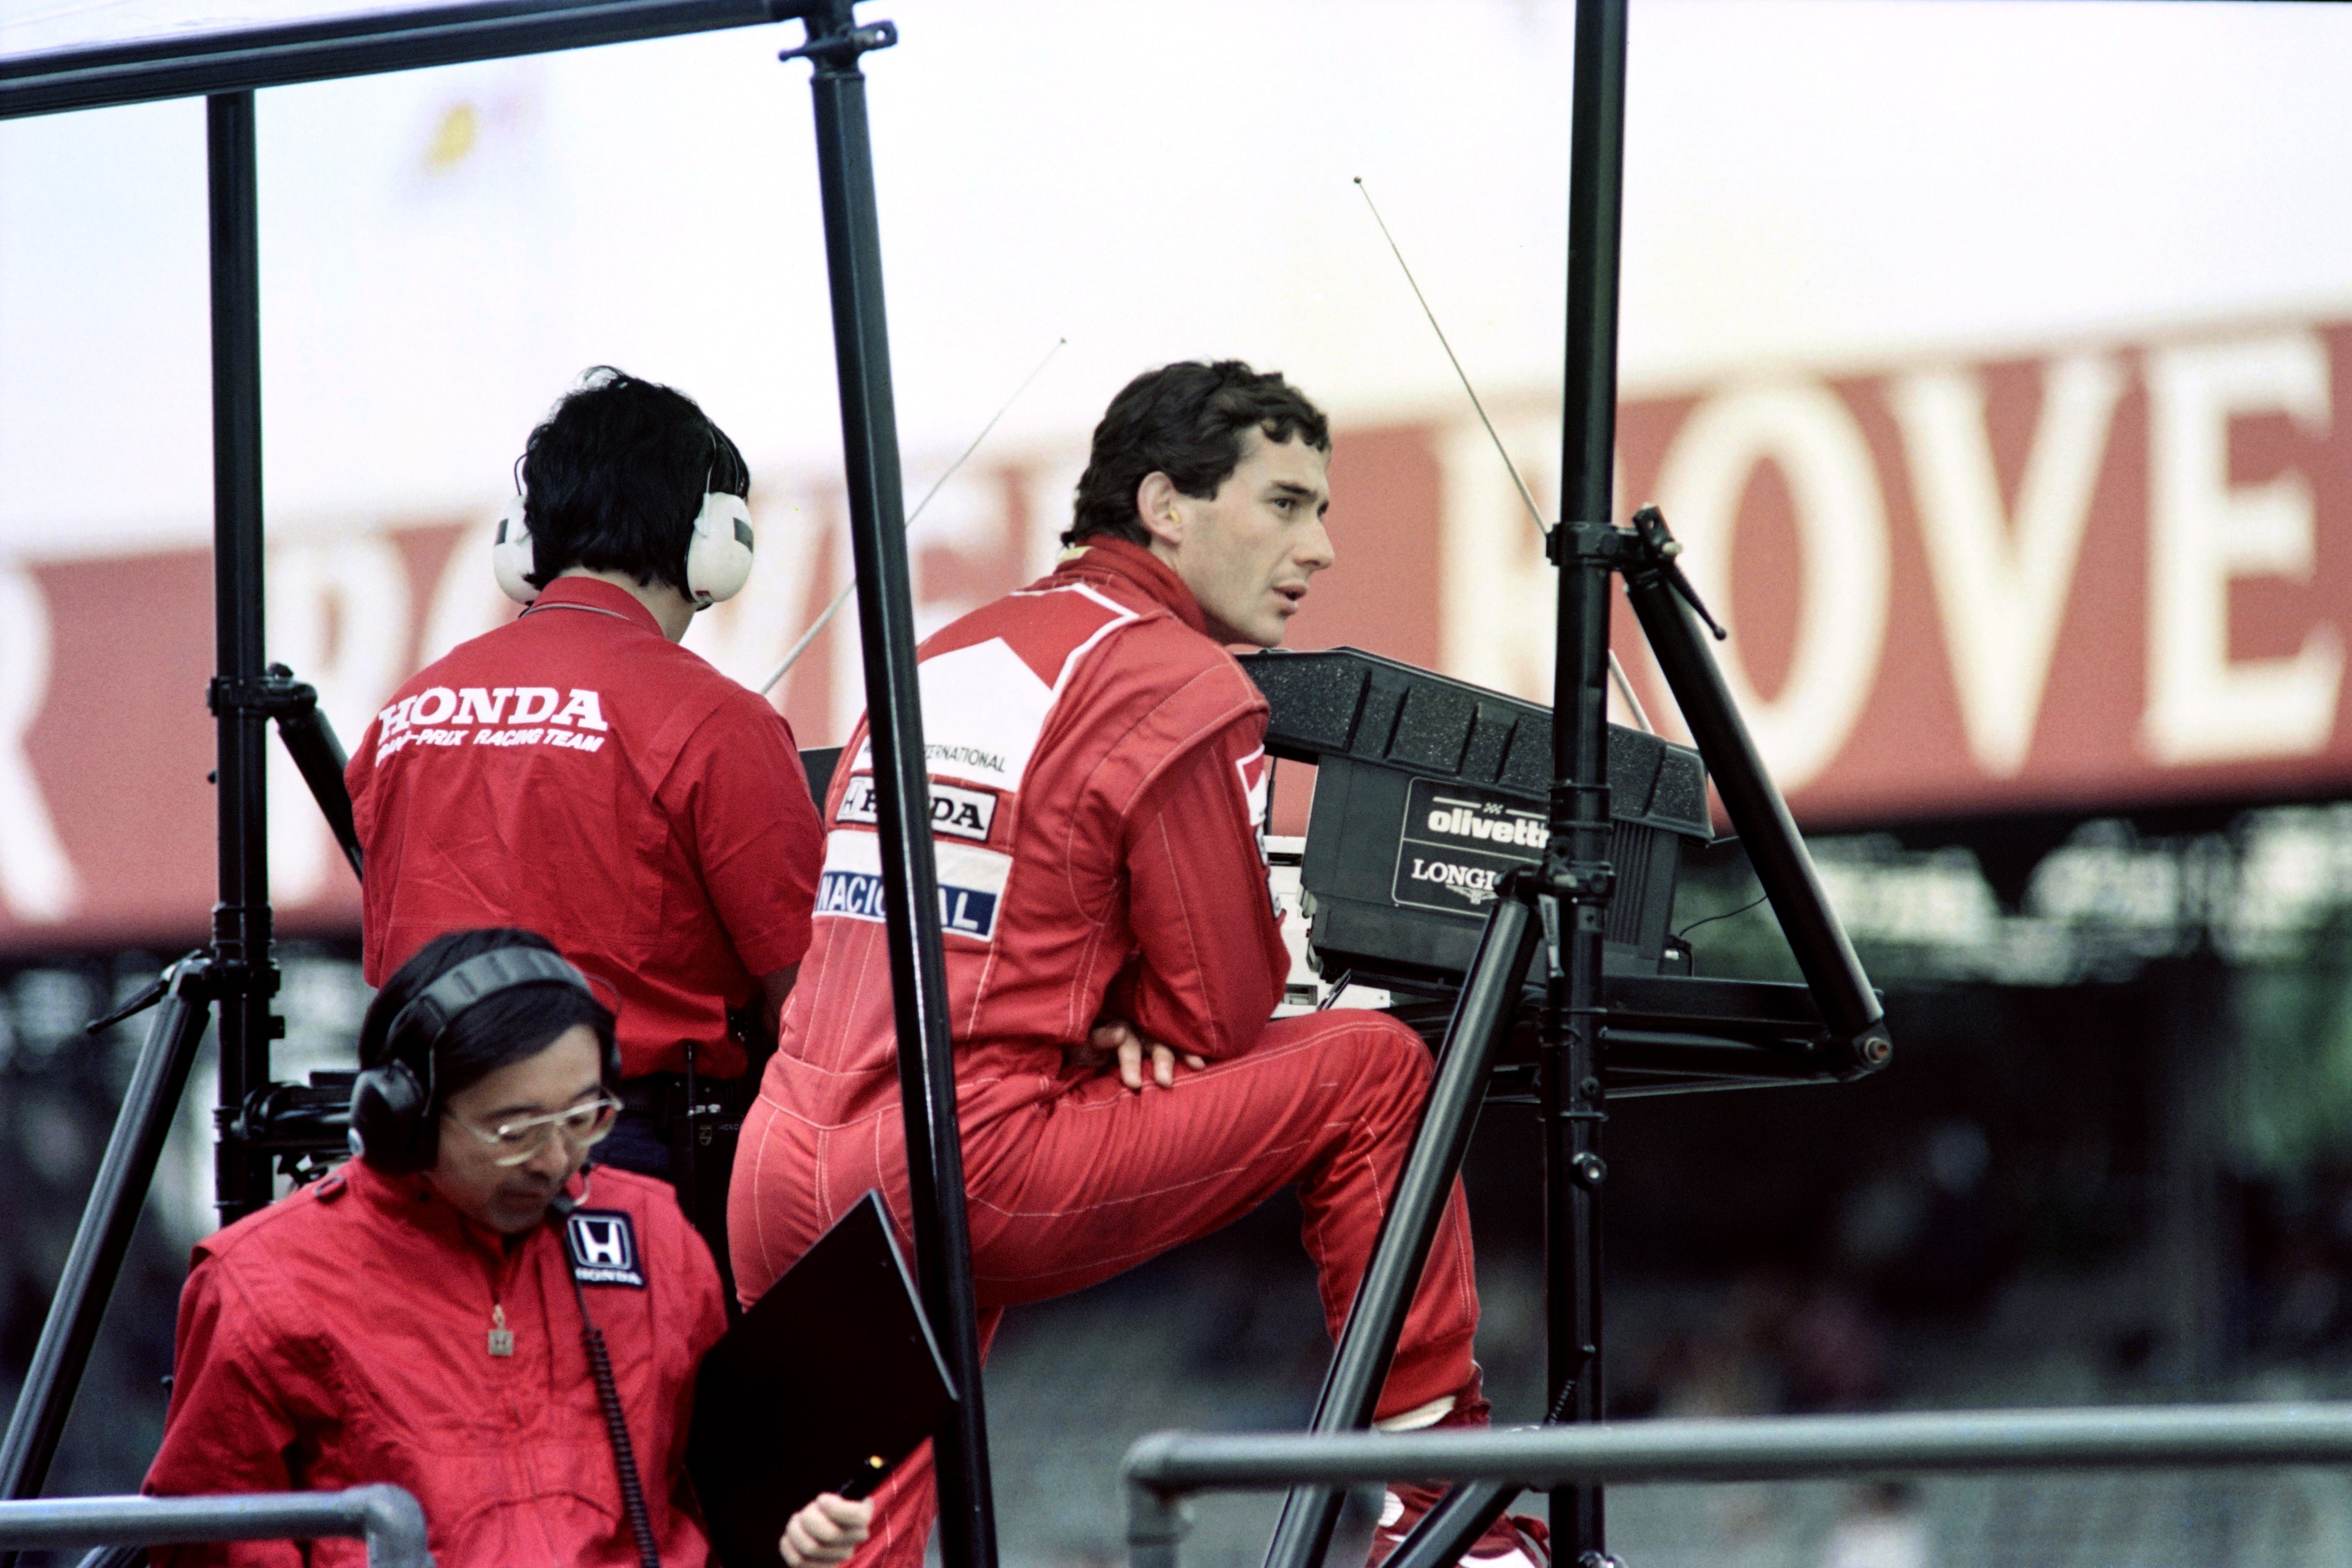 Ayrton Senna (McLaren) au Grand Prix de Grande Bretagne 1989